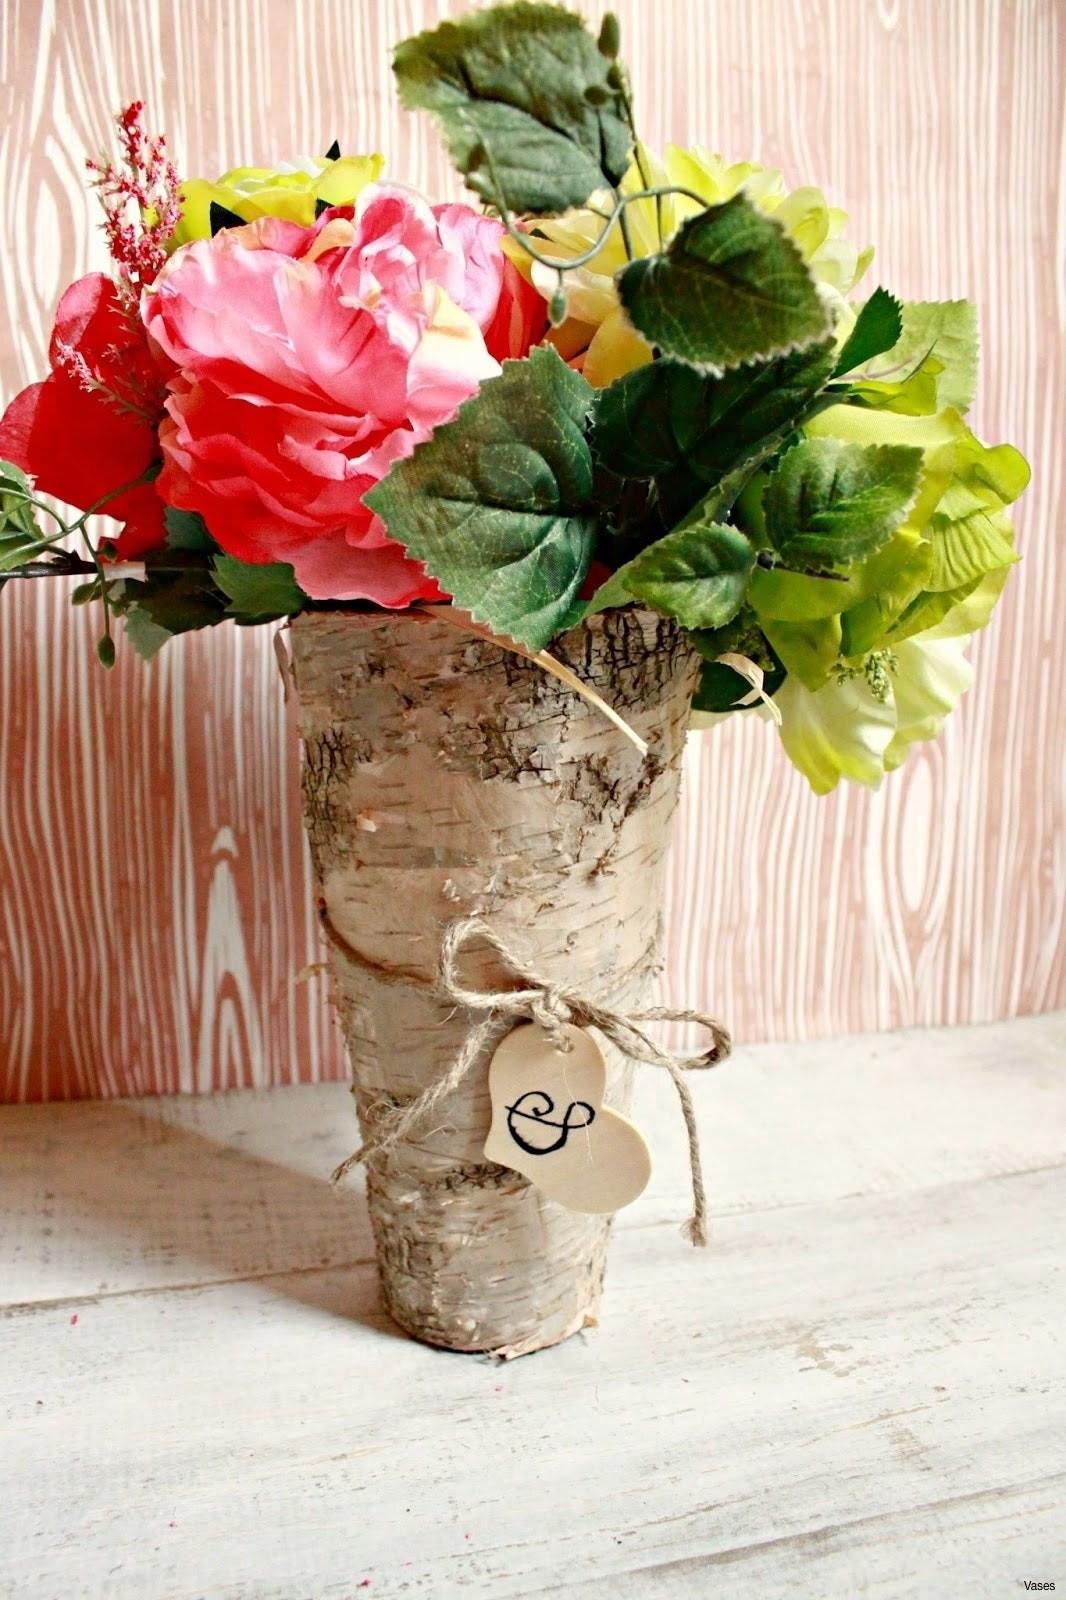 trumpet pilsner vase wholesale of great vases for weddings photos fun centerpiece vases 6 in decors inside comely wooden flower boxes flower vases weddings flower design vase